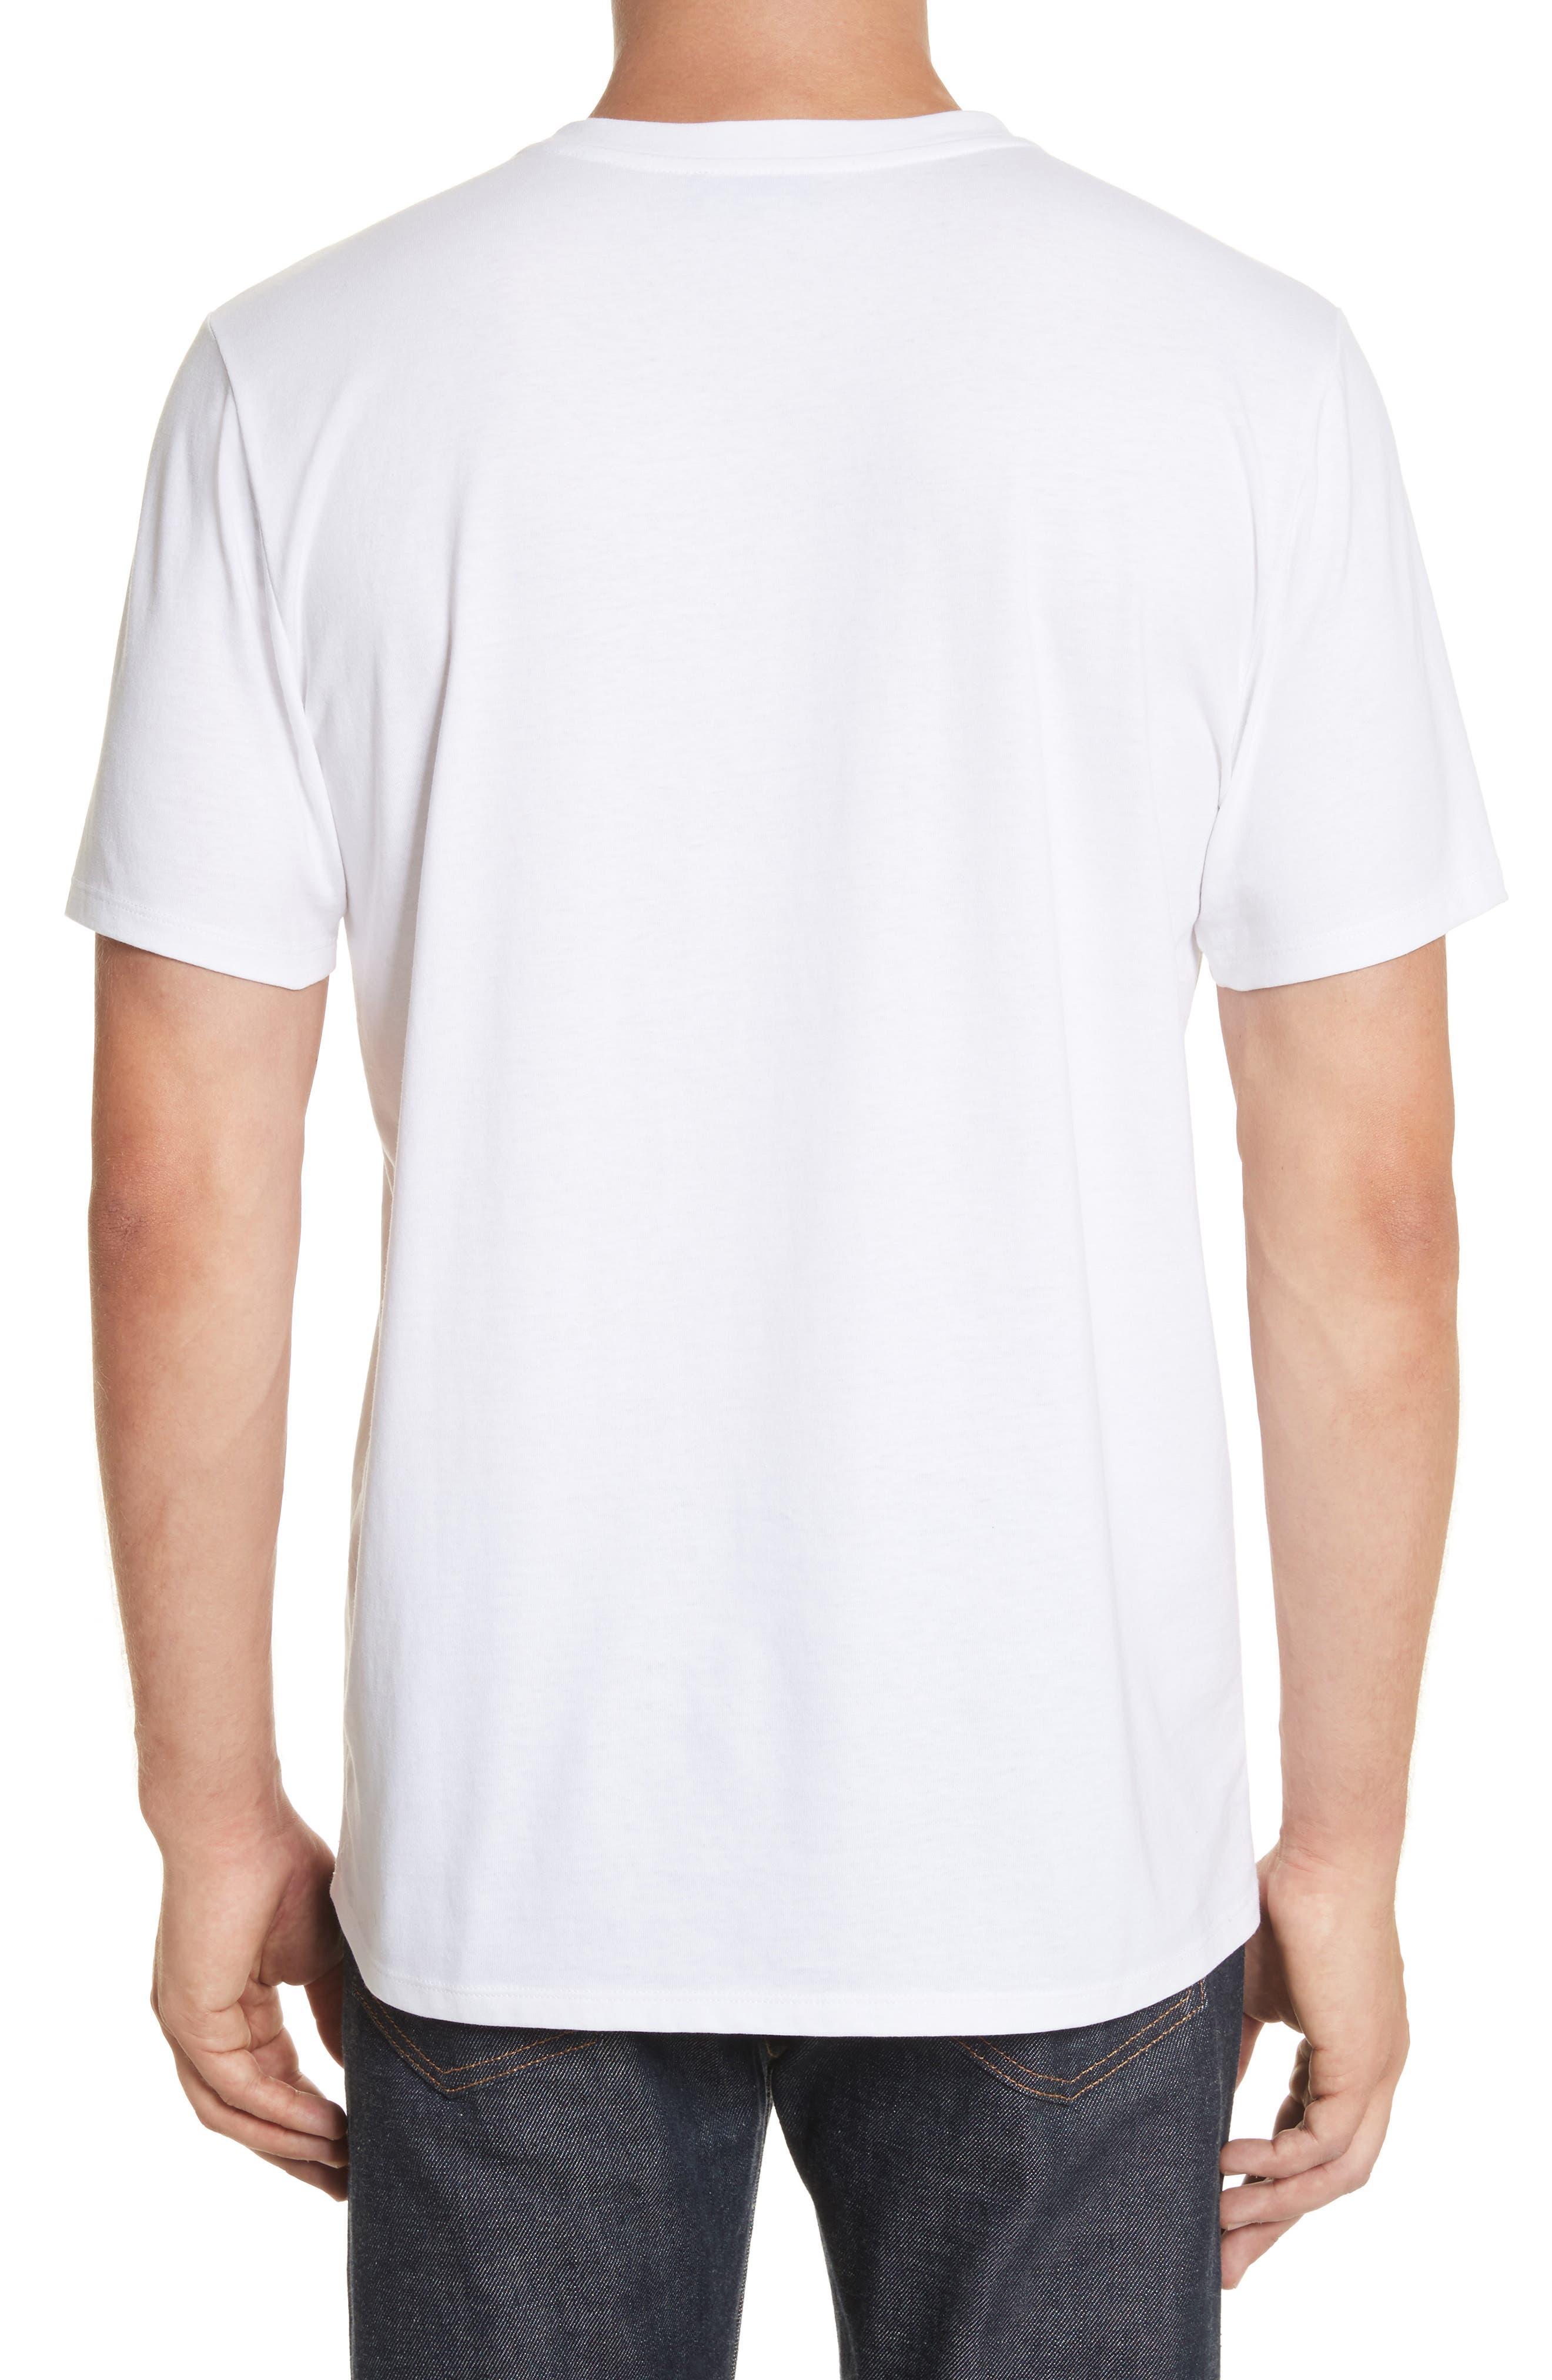 Serpentin T-Shirt,                             Alternate thumbnail 2, color,                             100